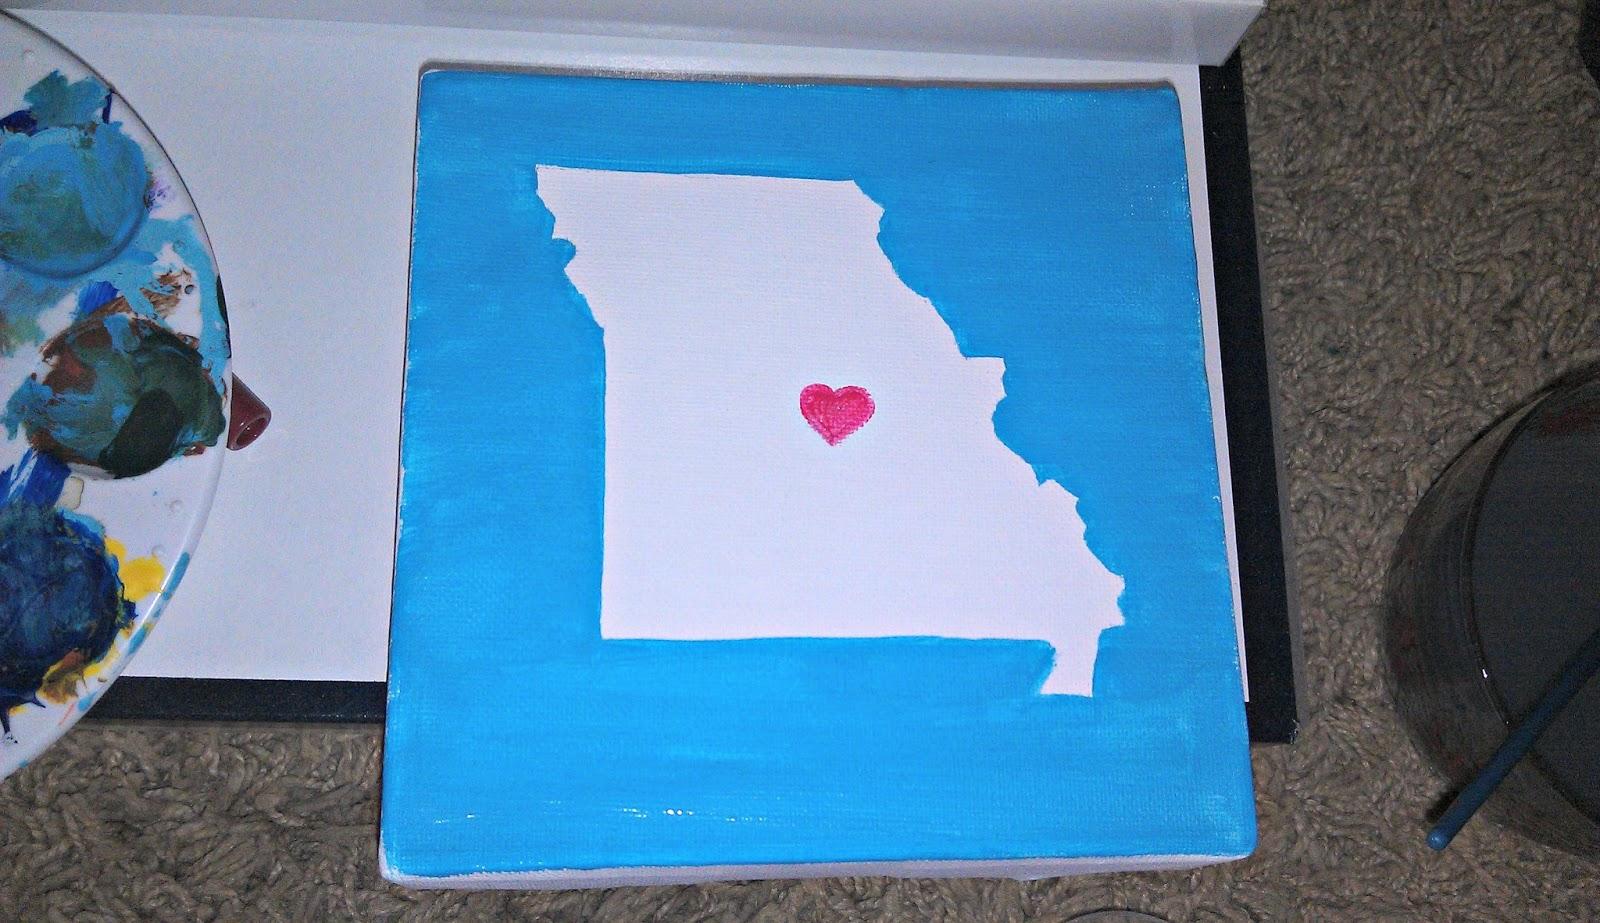 Blue Canvas Art Diy: The Generation To Create: DIY Missouri Canvas Art